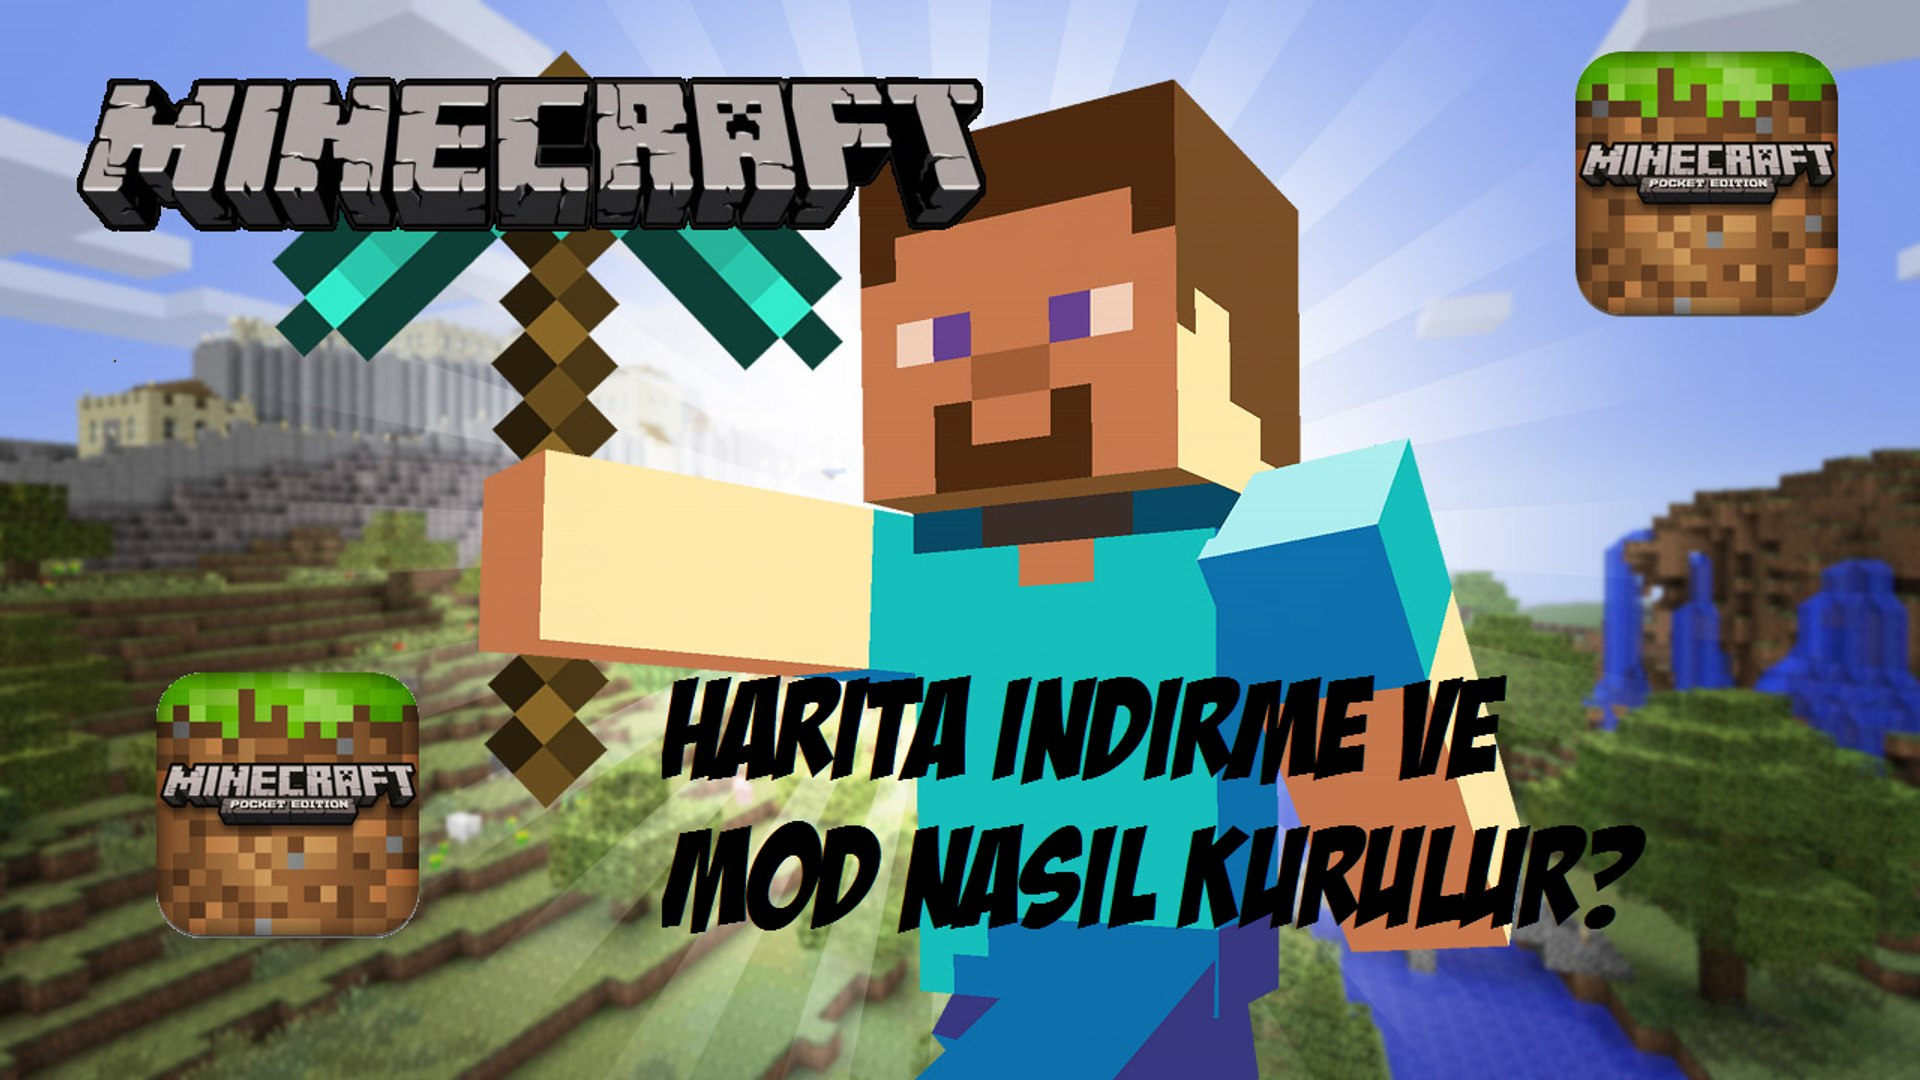 Minecraft Pe Harita Indirme Ve Mod Kurma Nasil Yapilir Turkce Re Captured Dailymotion Video